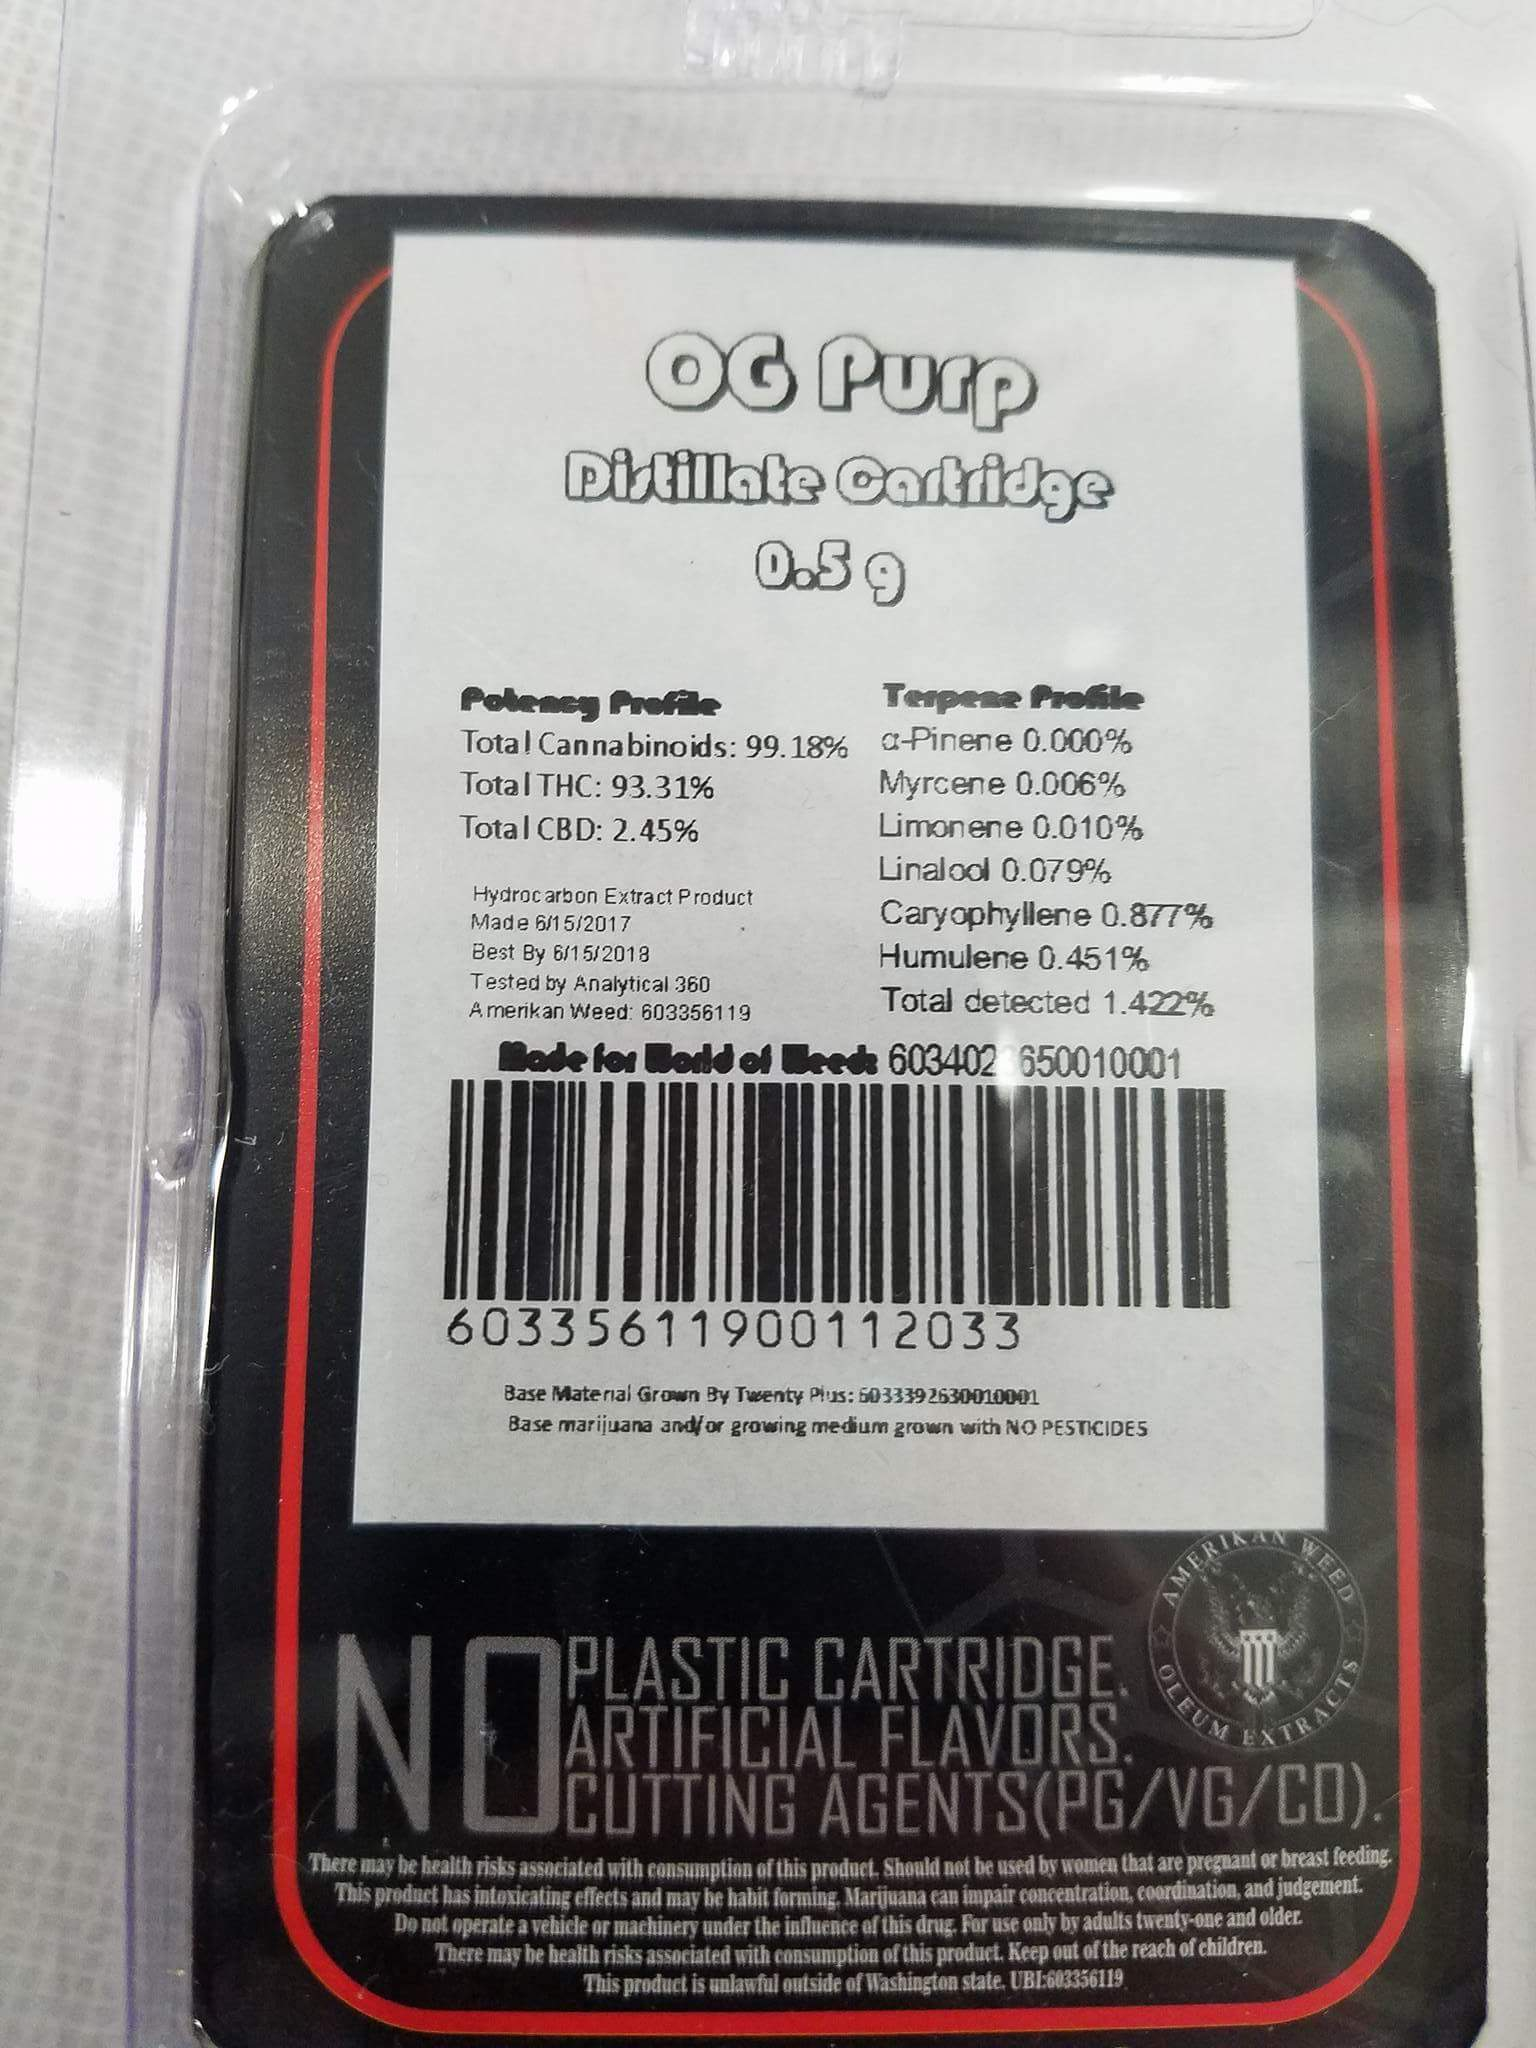 Oleum Extracts OG Purp Distillate Cartridge